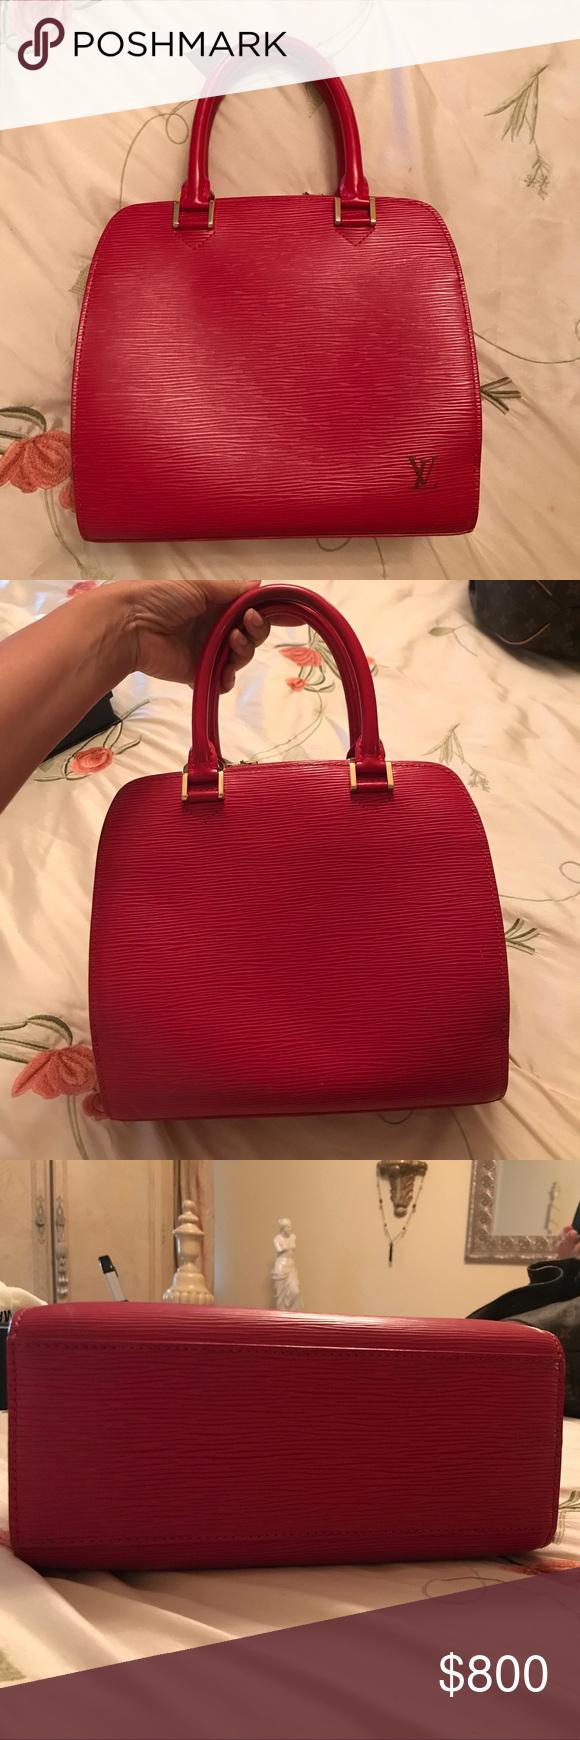 636433ac Louis Vuitton Pont Neuf bag in Red Epi leather Louis Vuitton Pont ...